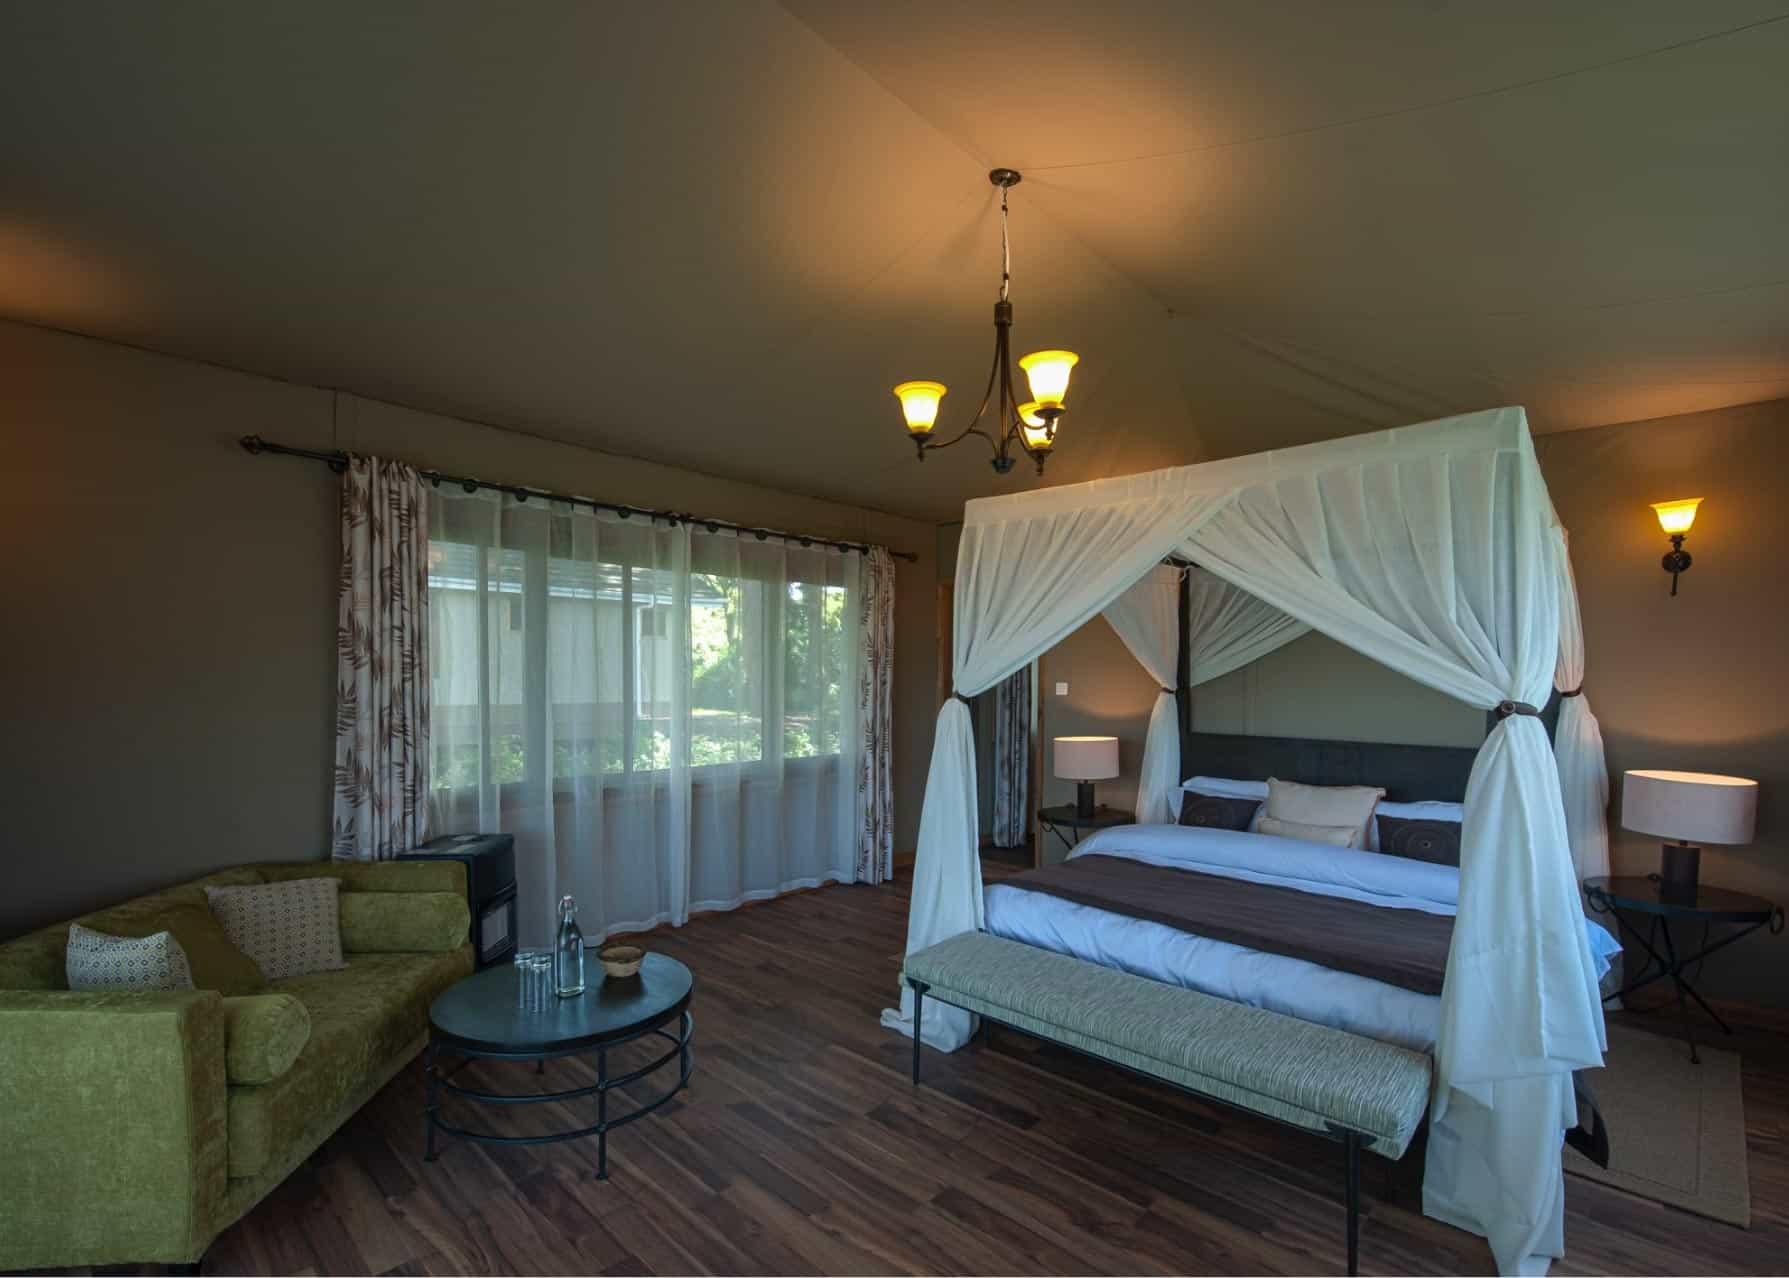 Lions Paw Camp room inside Ngorongoro conservation area, Tanzania